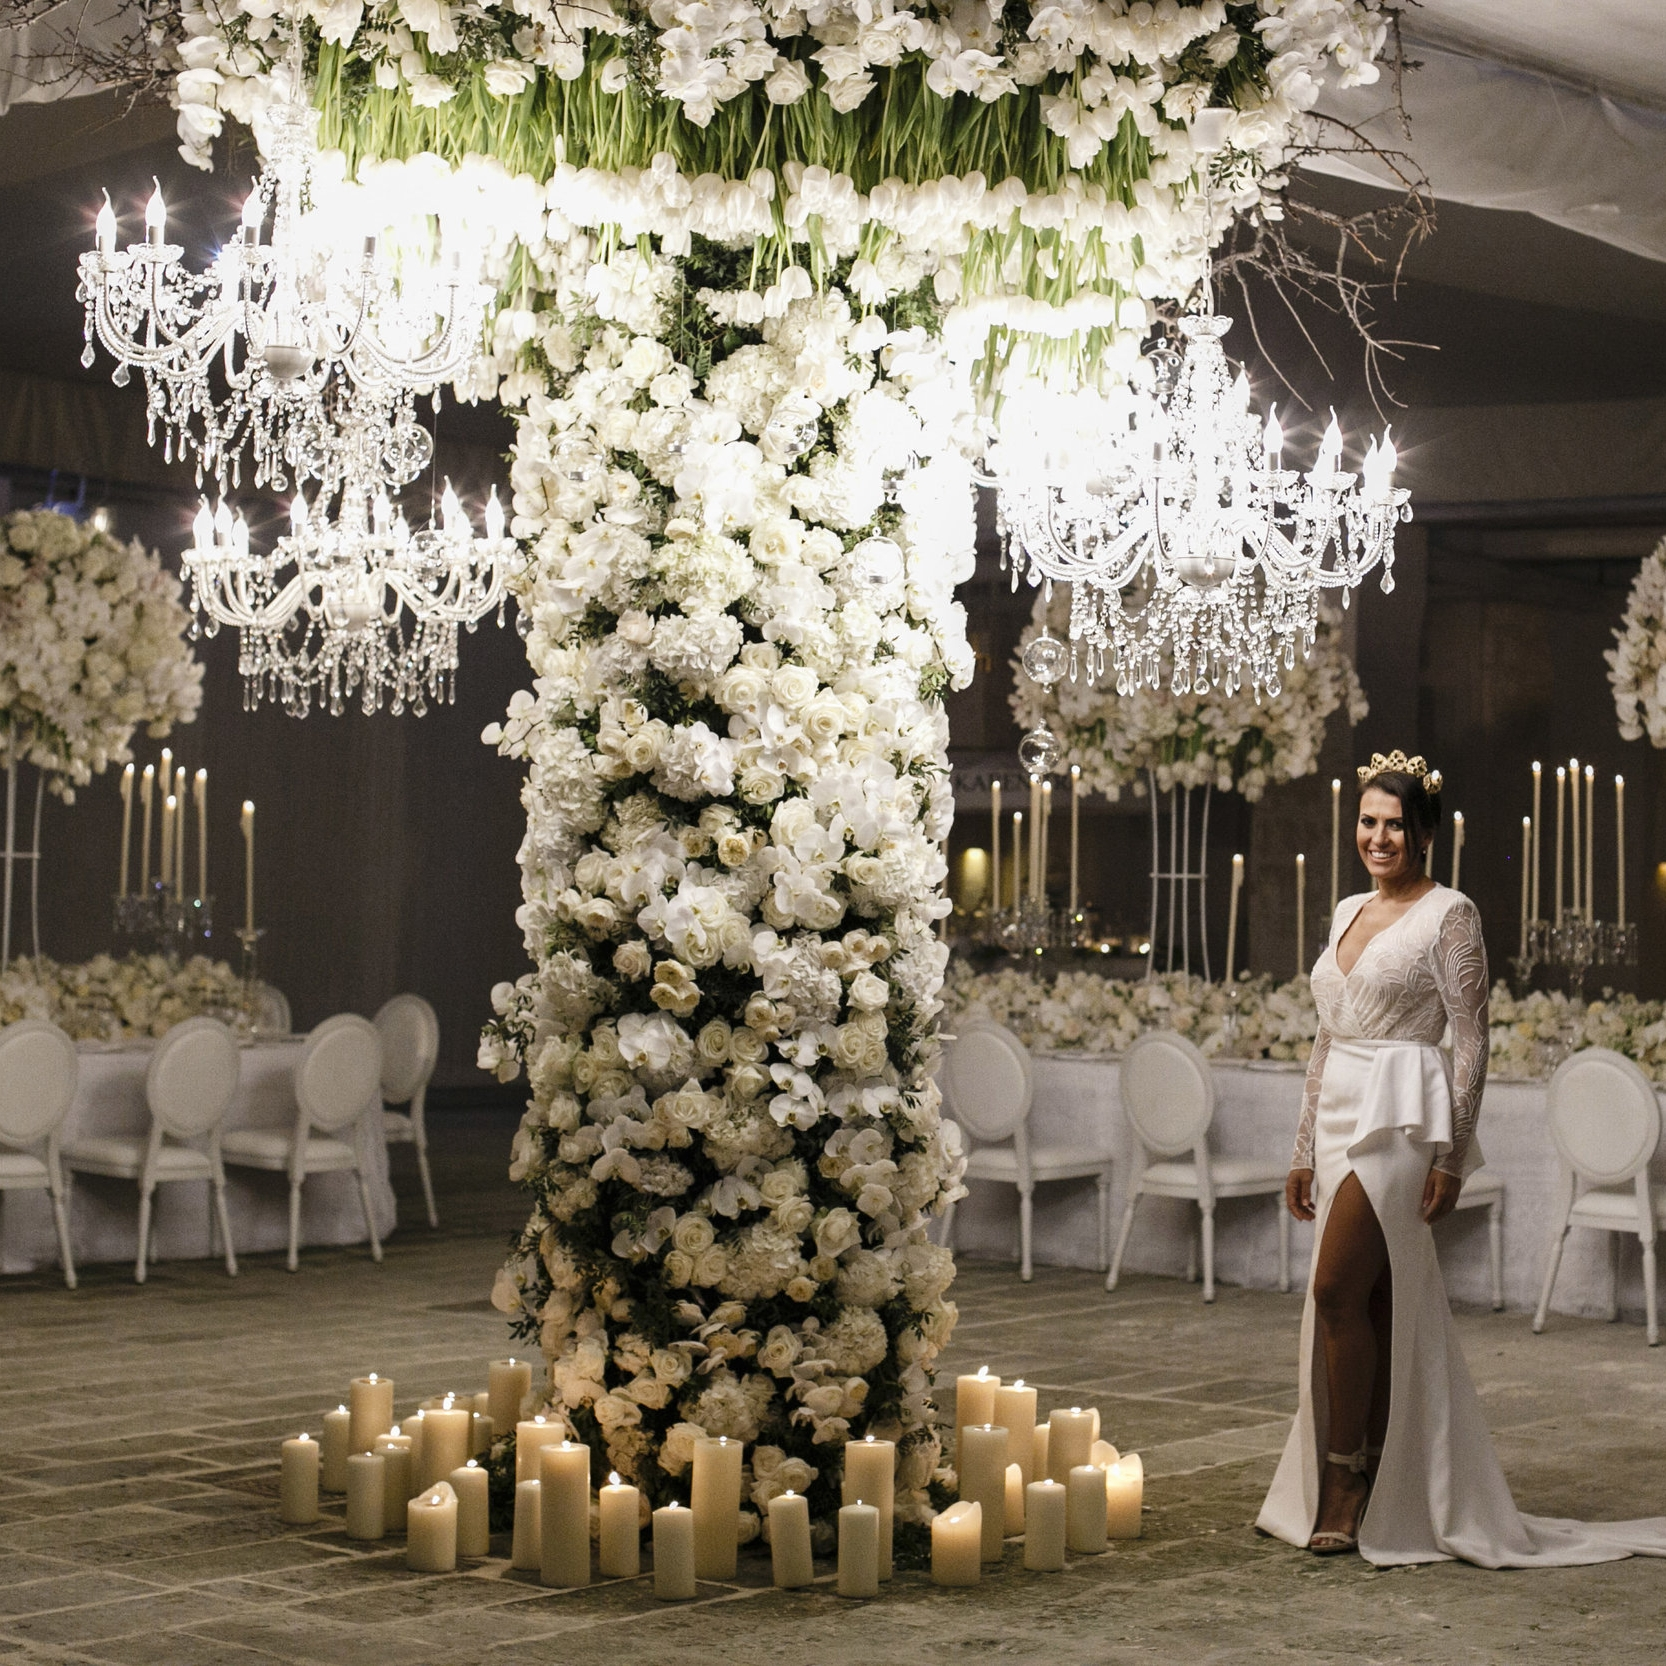 nadia_duran_the_floral_experience_destination_weddings_italy.jpg